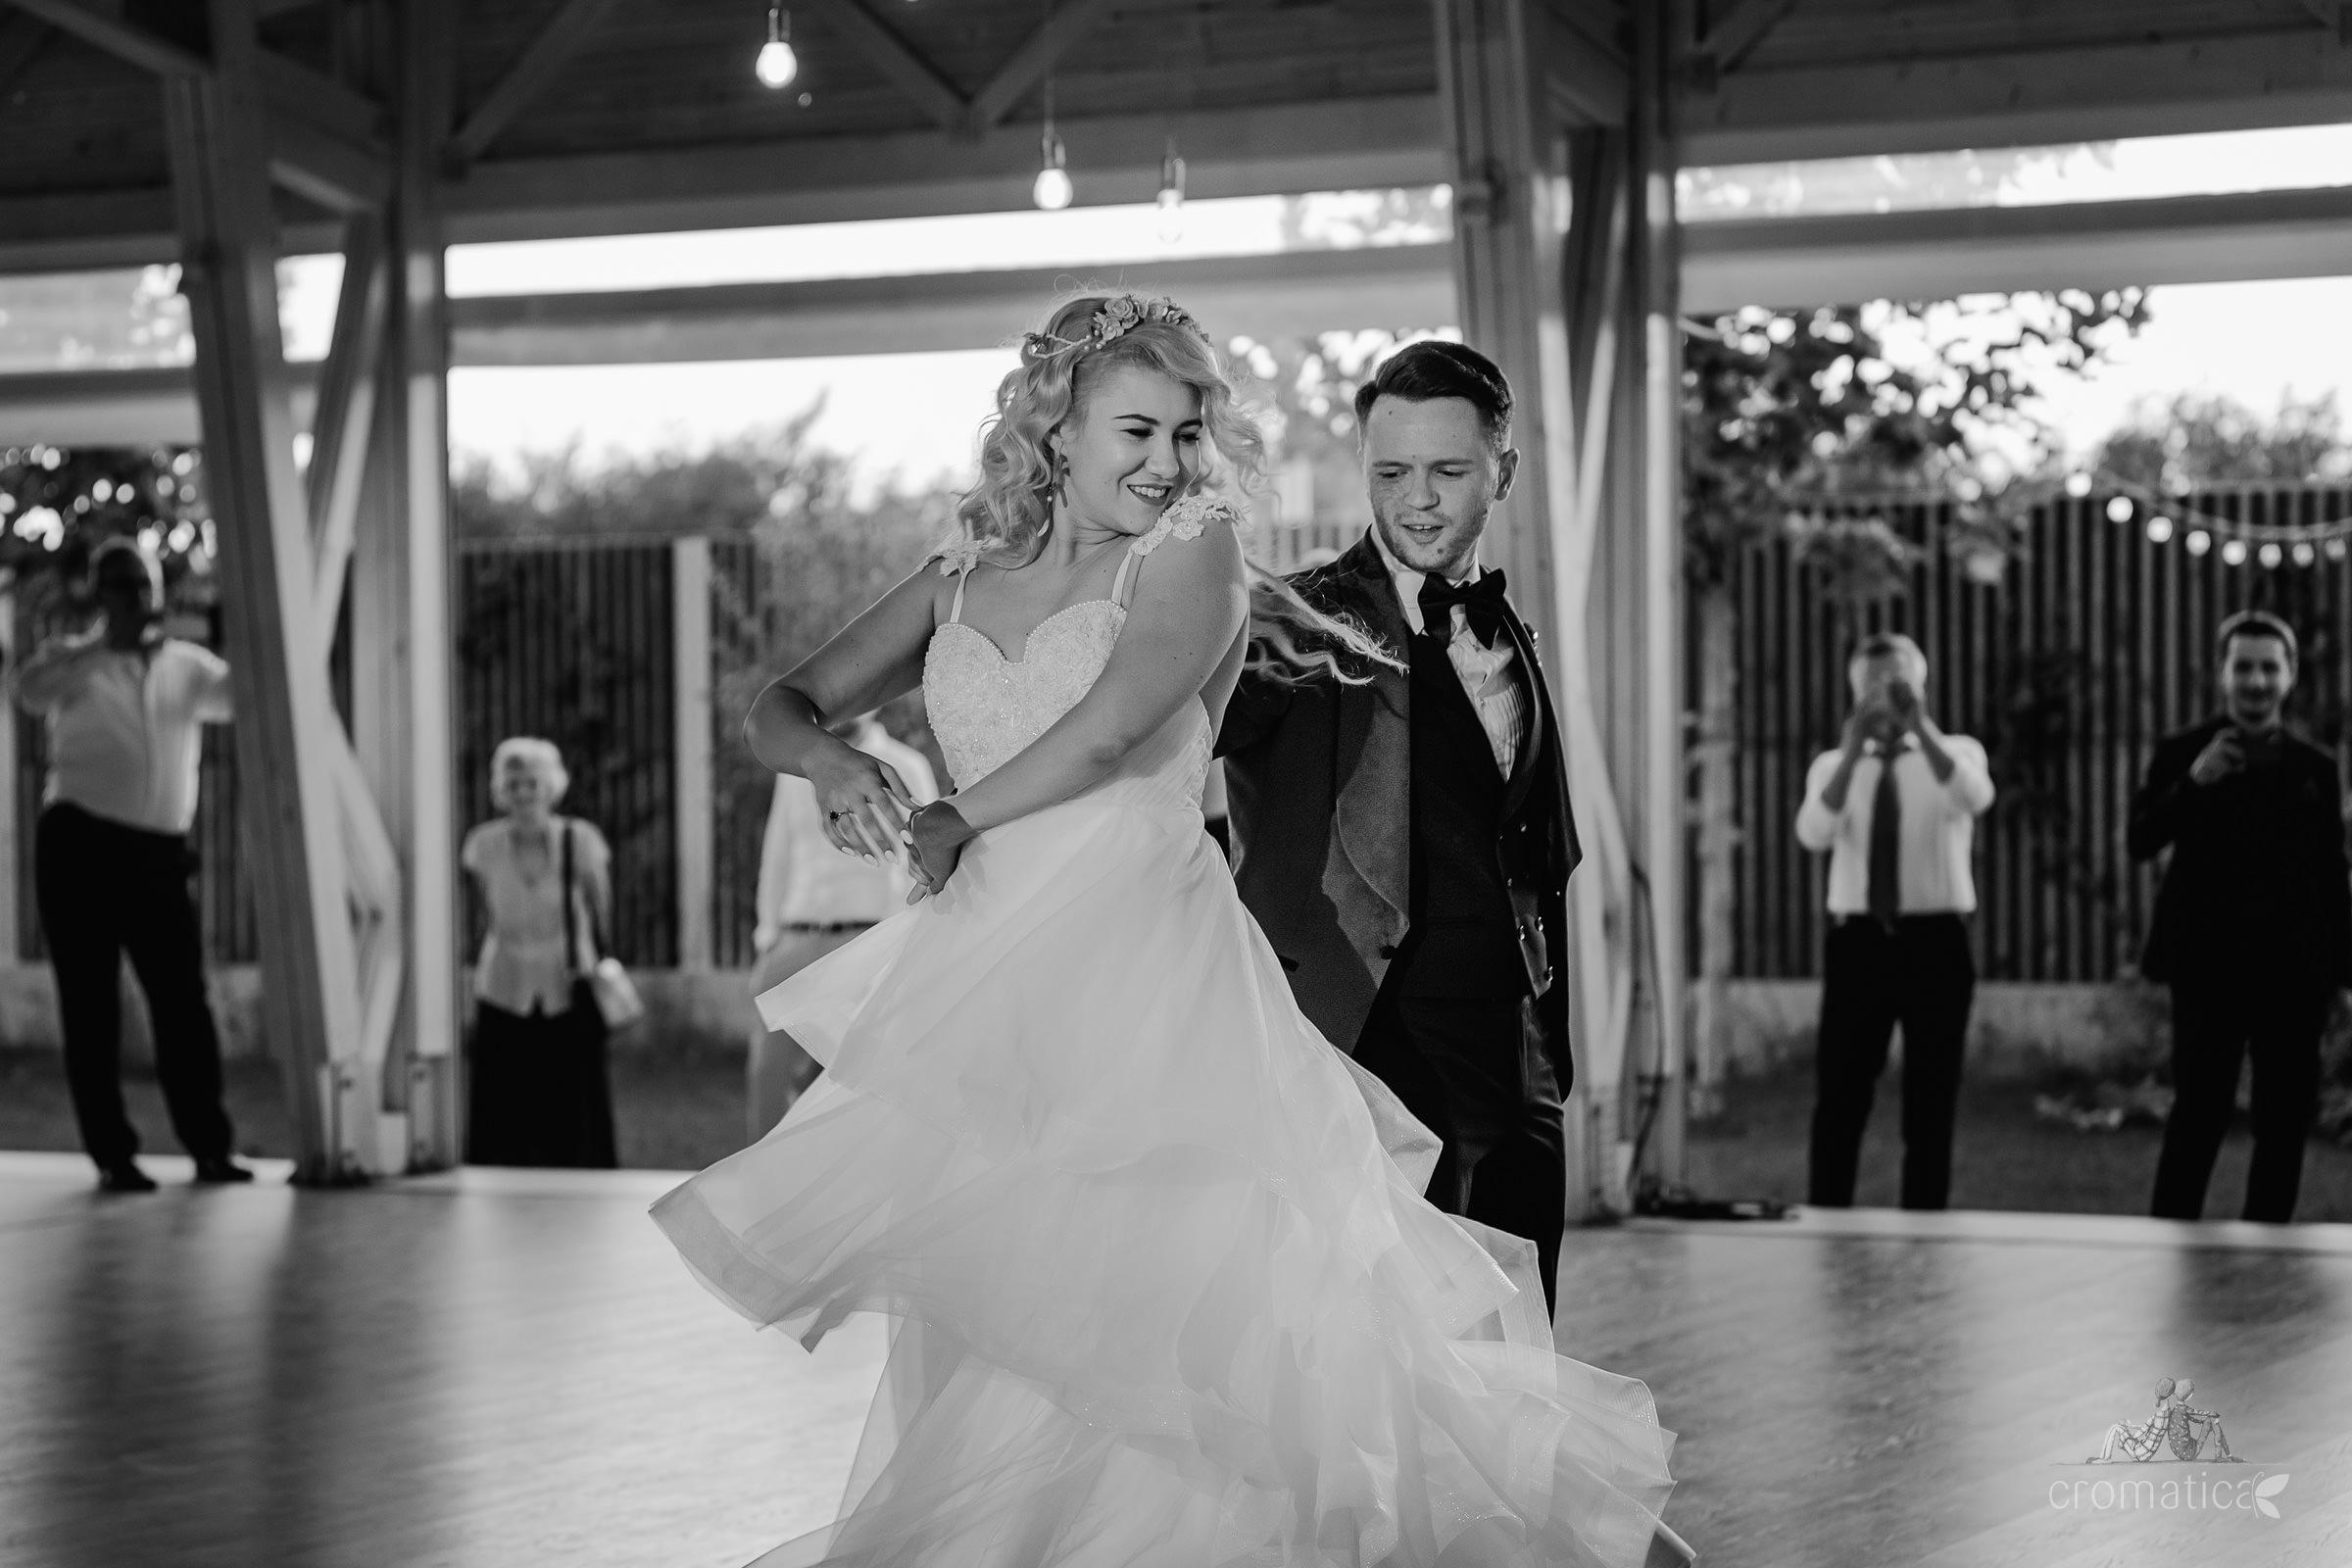 ana mihai fotografii nunta gradina lahovari 070